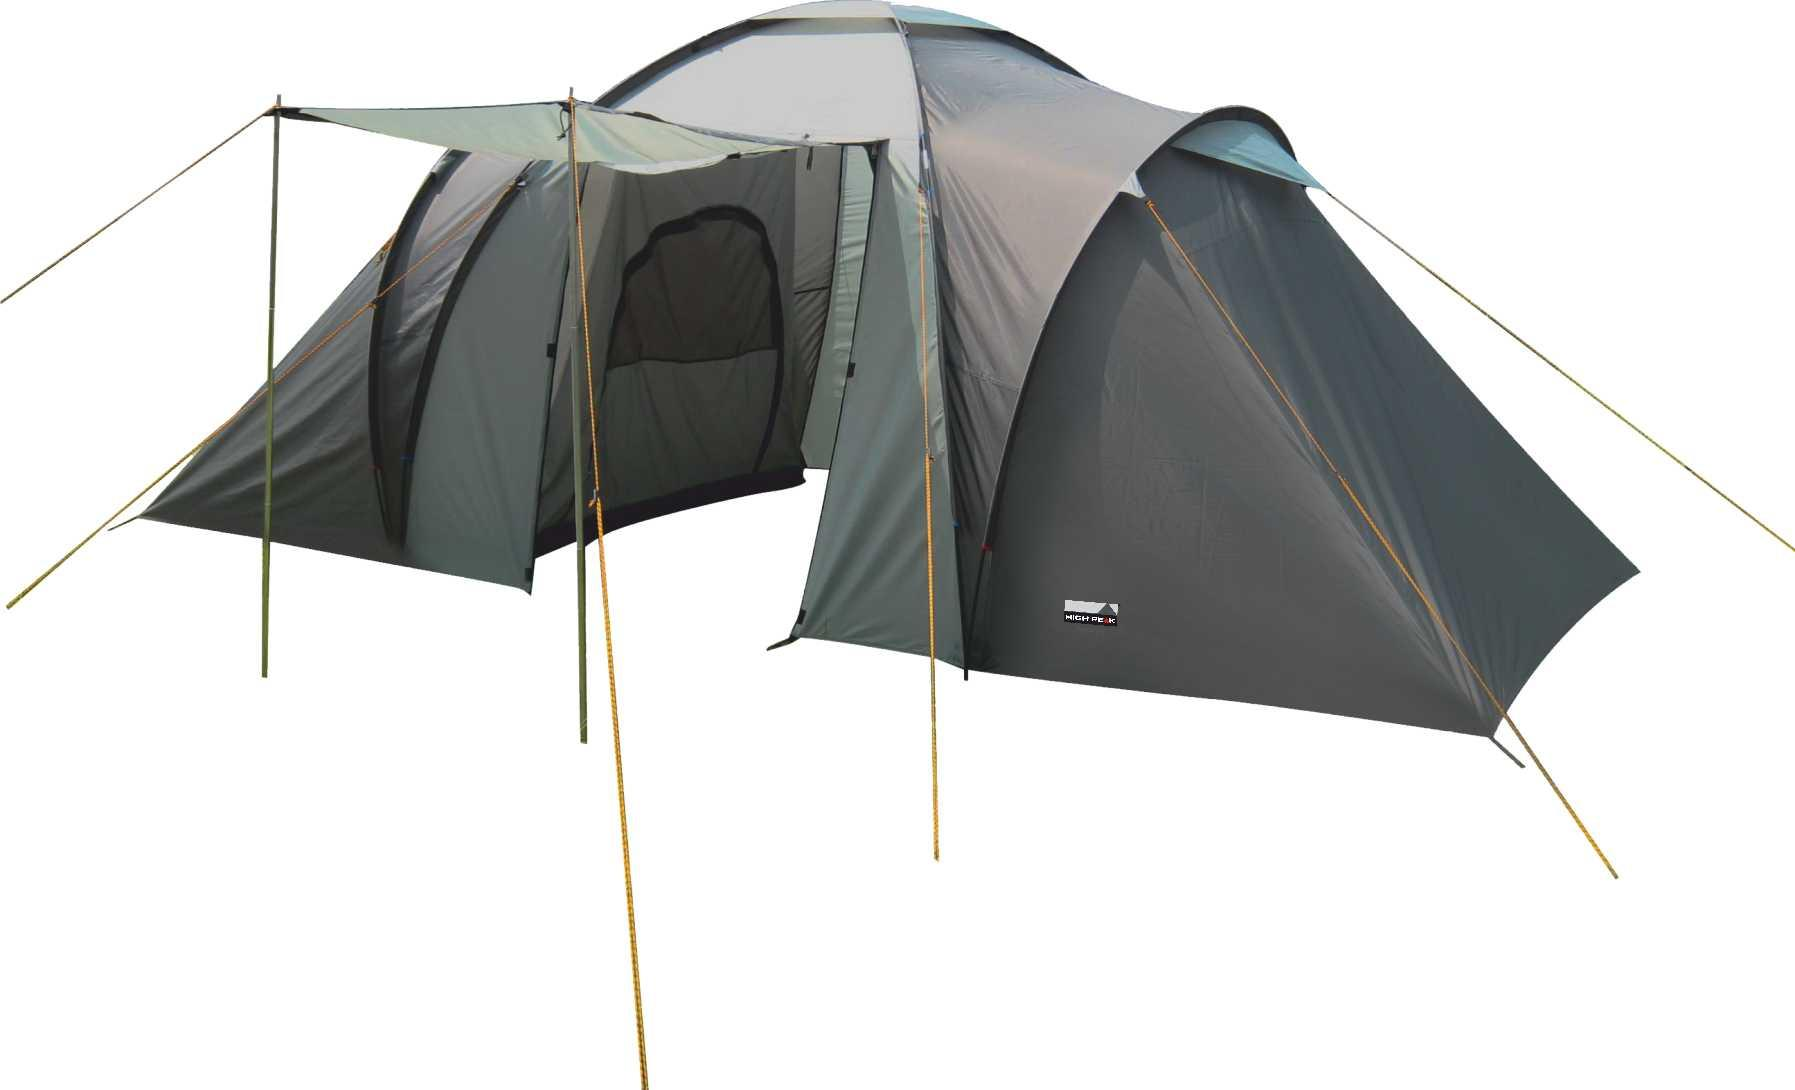 High Peak Nevada 2 3 4 You  sc 1 st  Best Tent 2018 & High Peak Nevada 3 Tent - Best Tent 2018